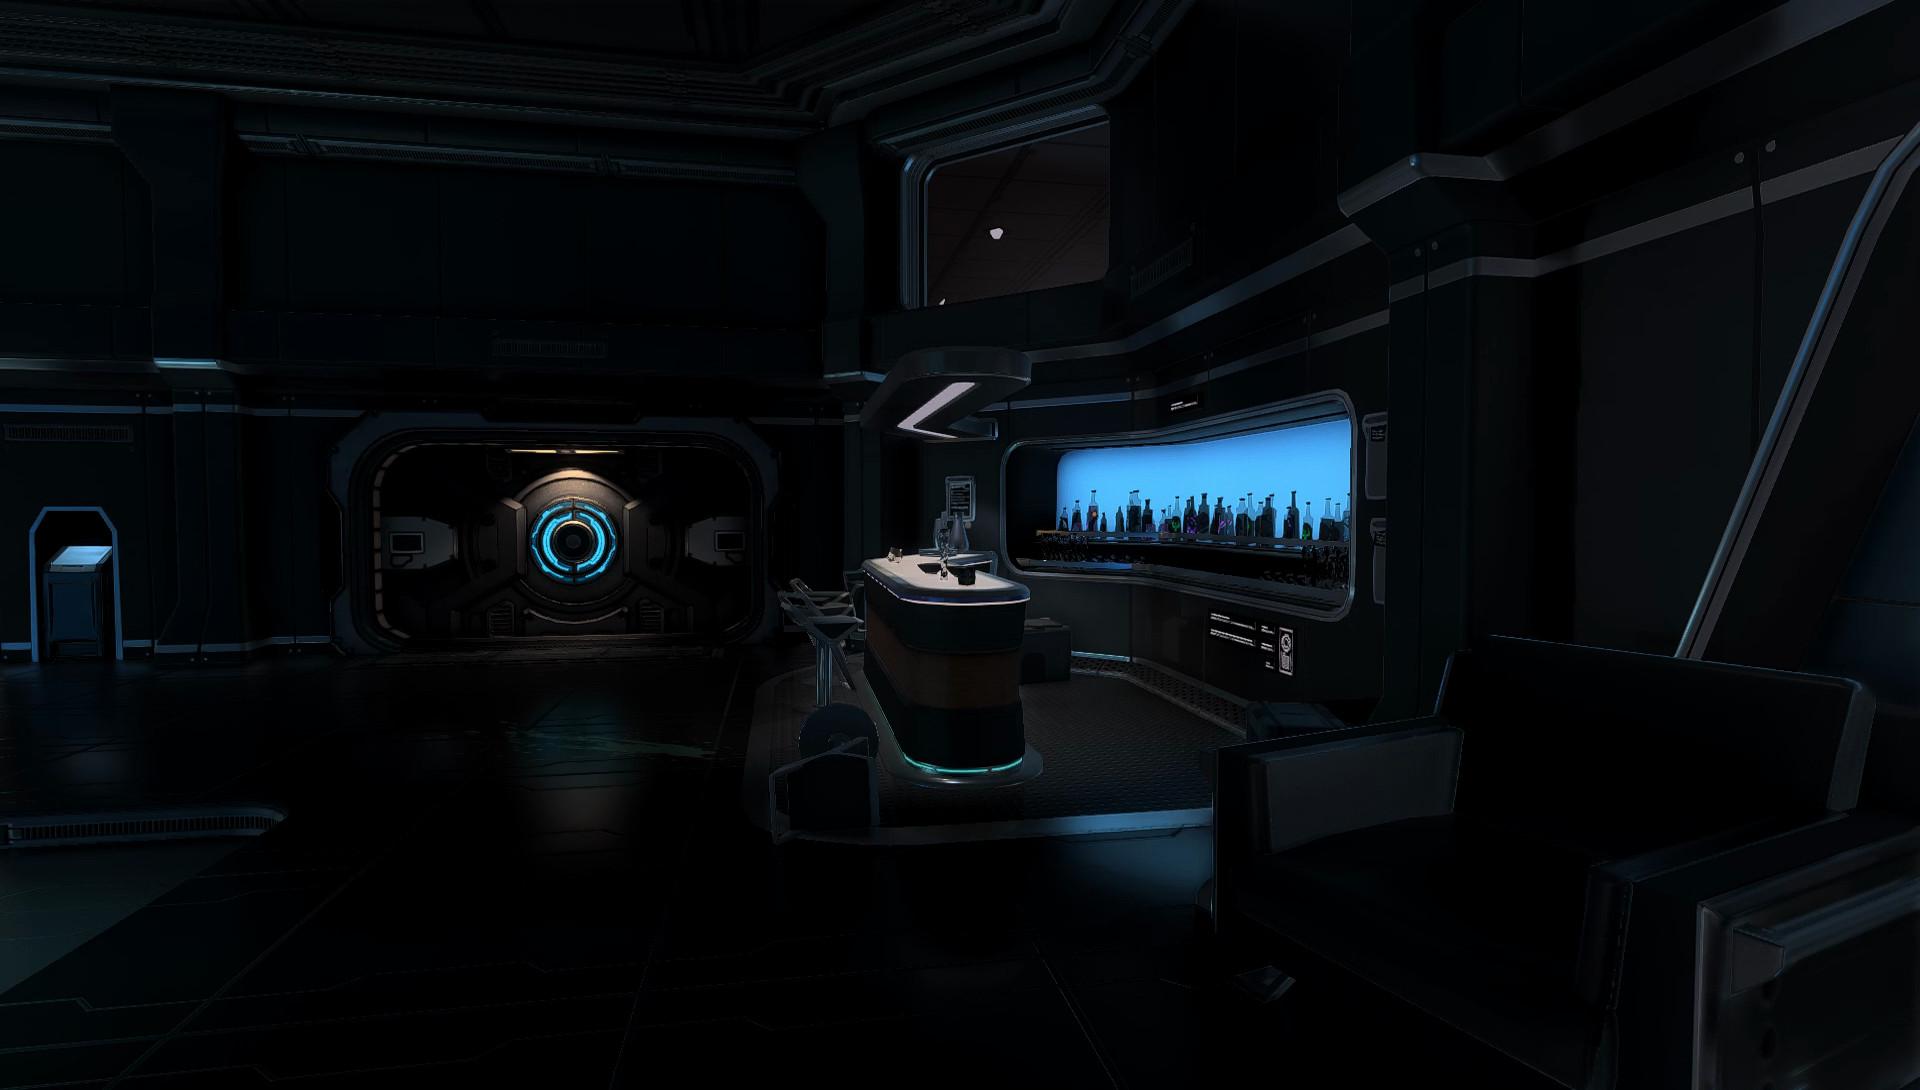 The Station screenshot